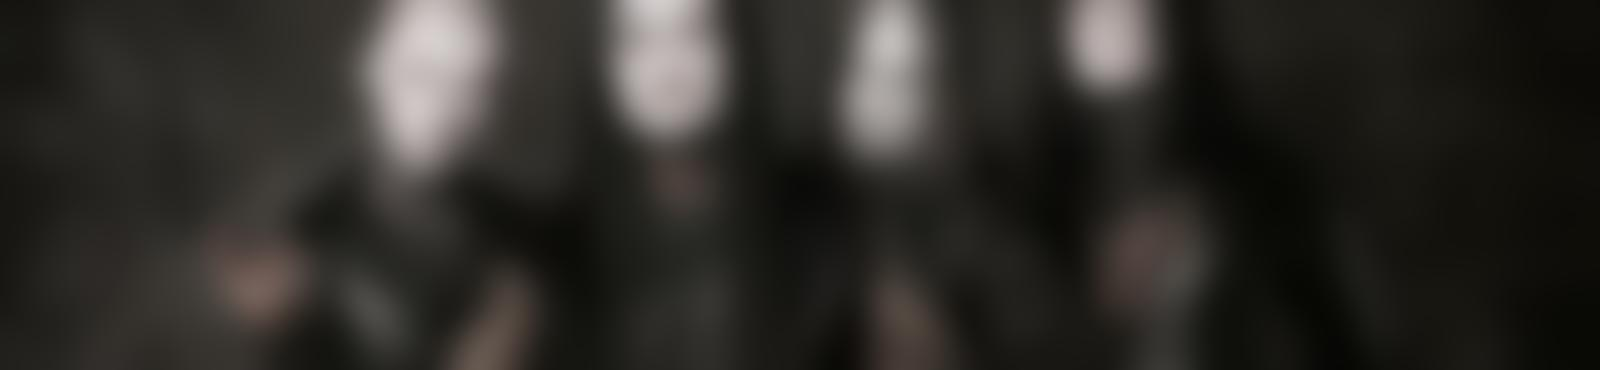 Blurred 5c52534d 767c 4f90 8bf6 acd9e07dc873